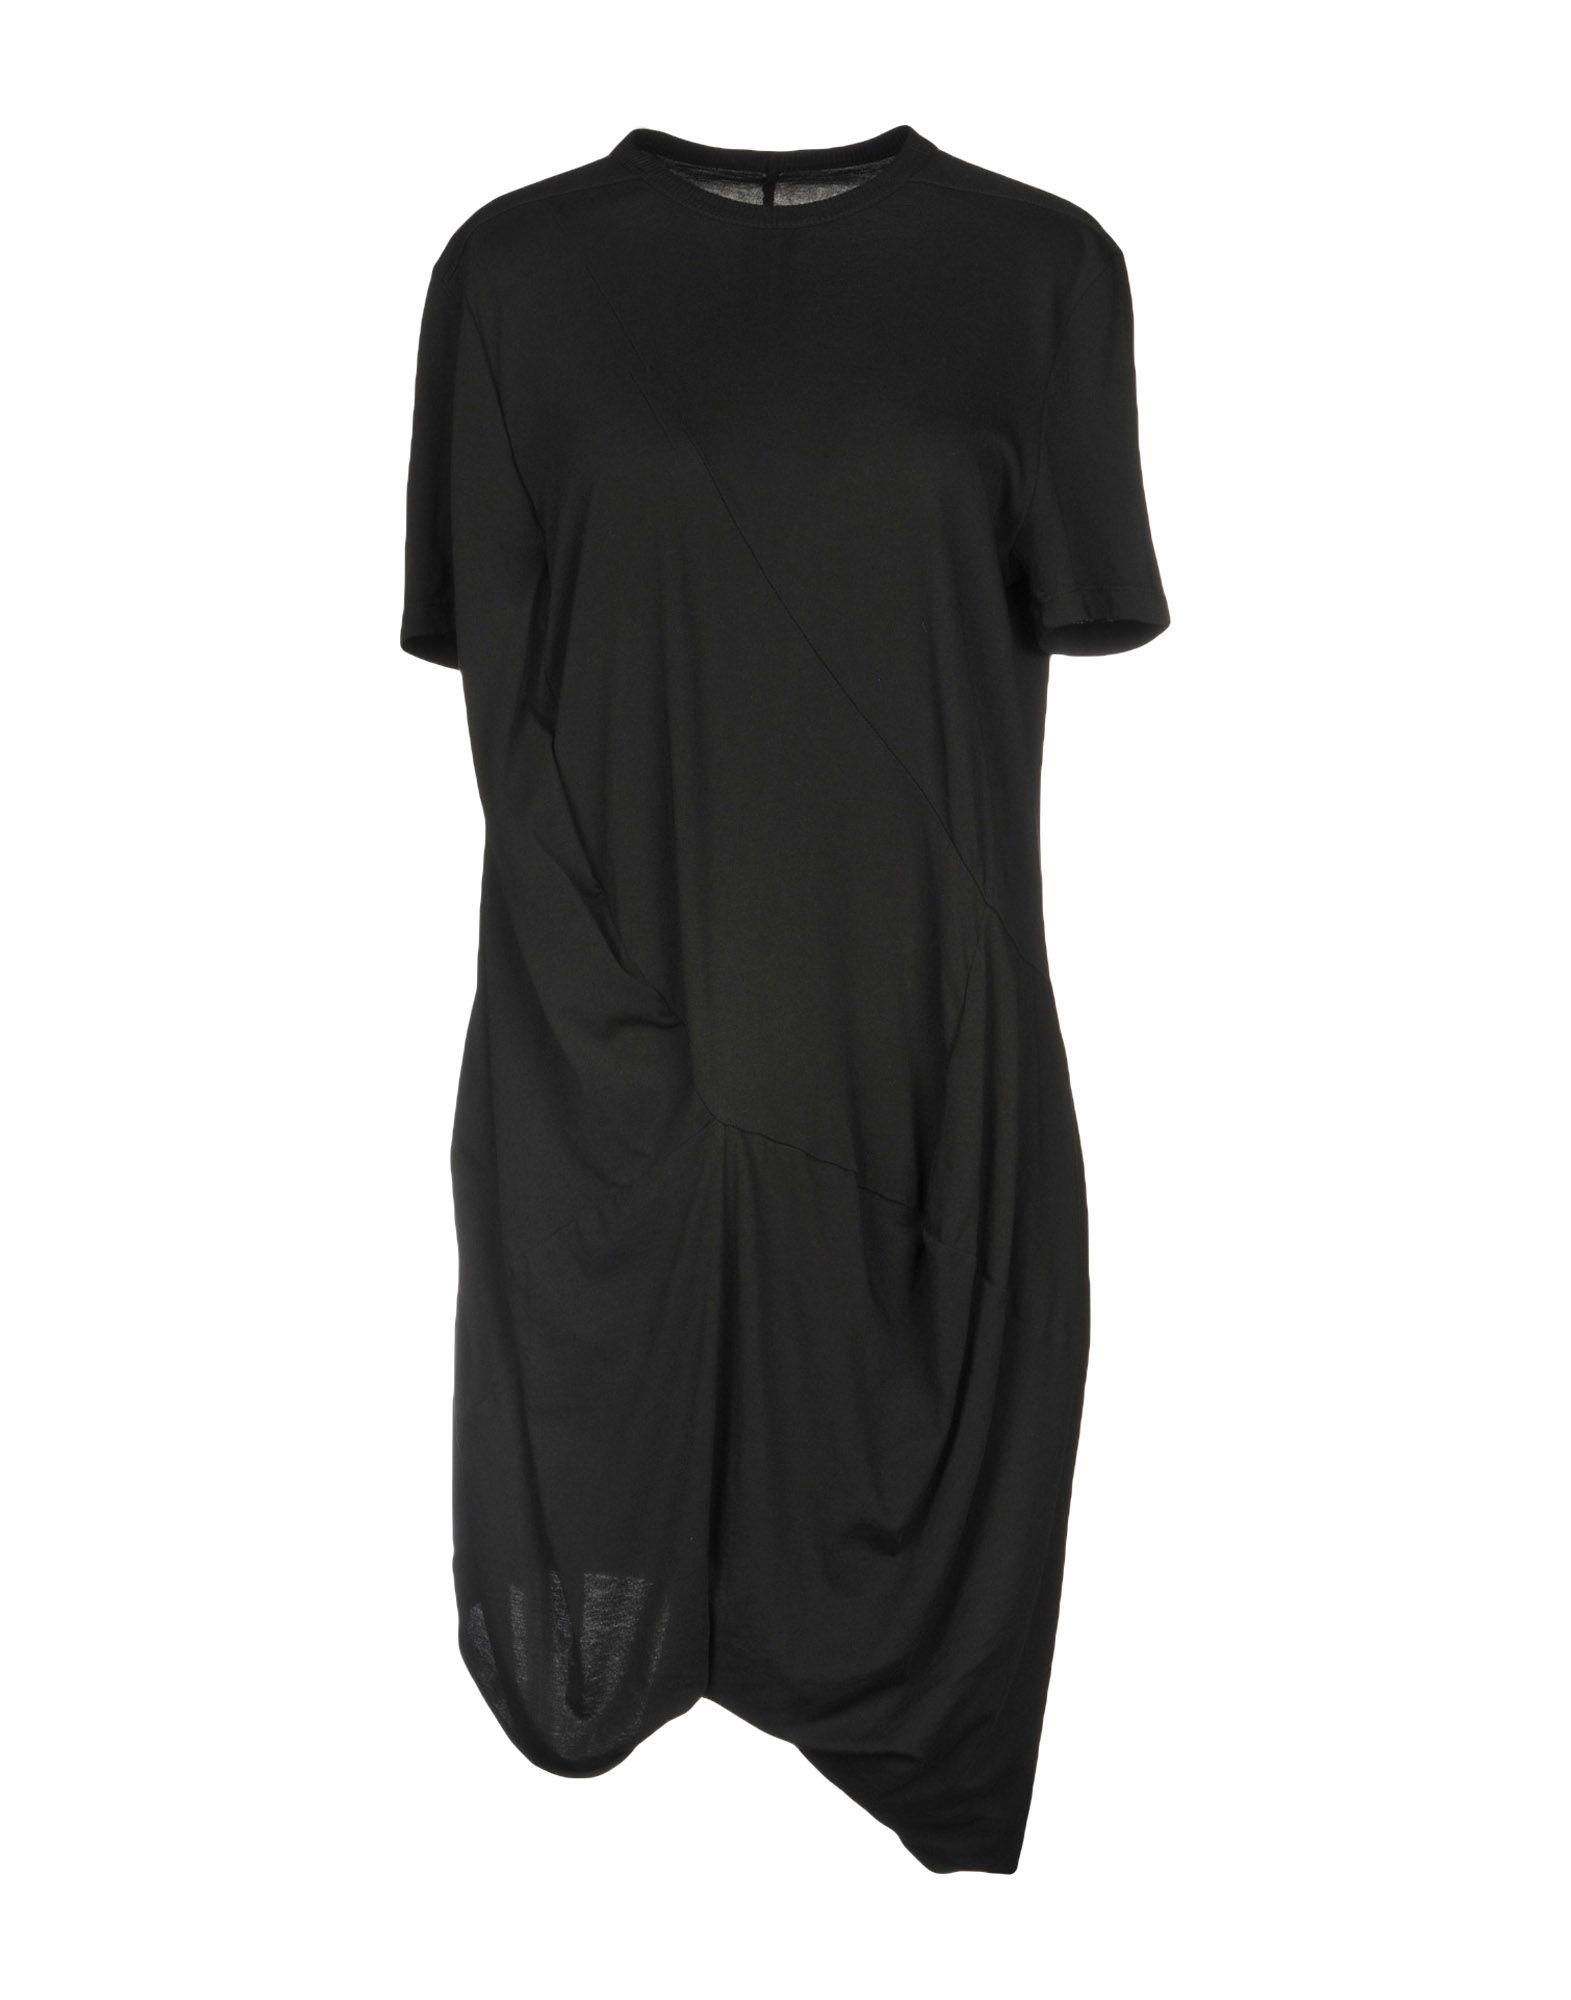 DRKSHDW by RICK OWENS Короткое платье пуловер quelle rick cardona by heine 6170